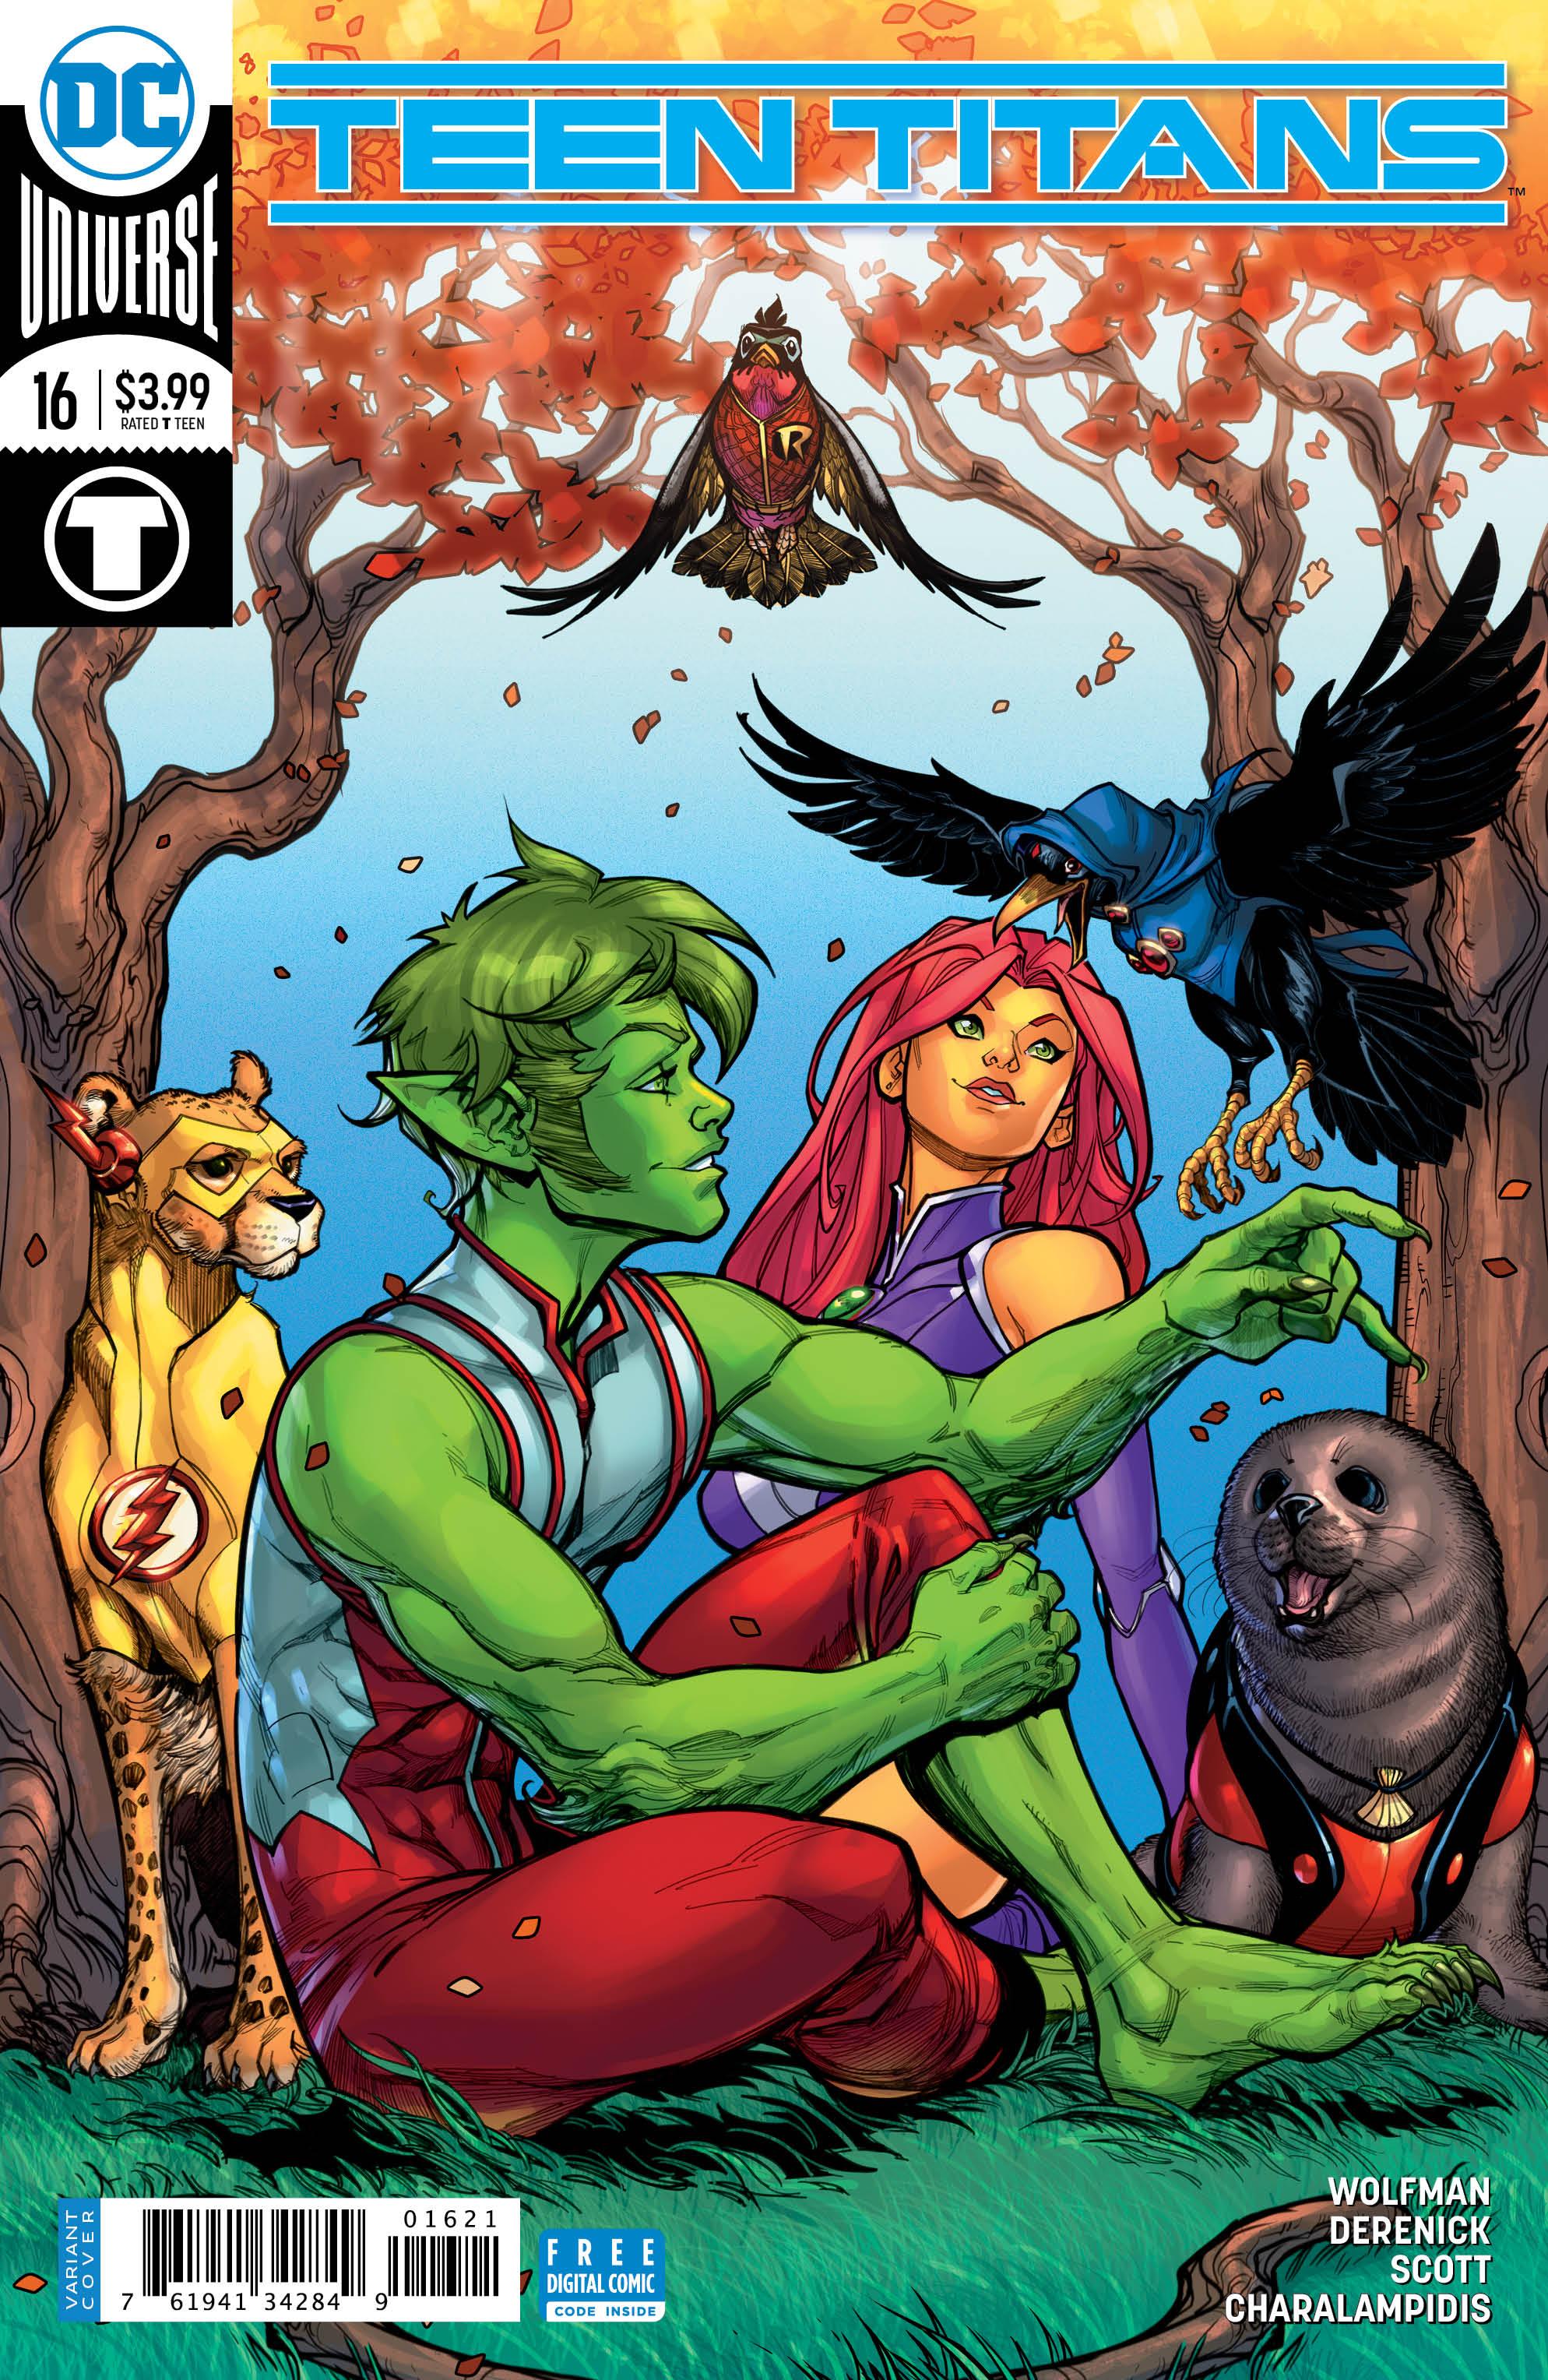 Teen Titans #16 cover